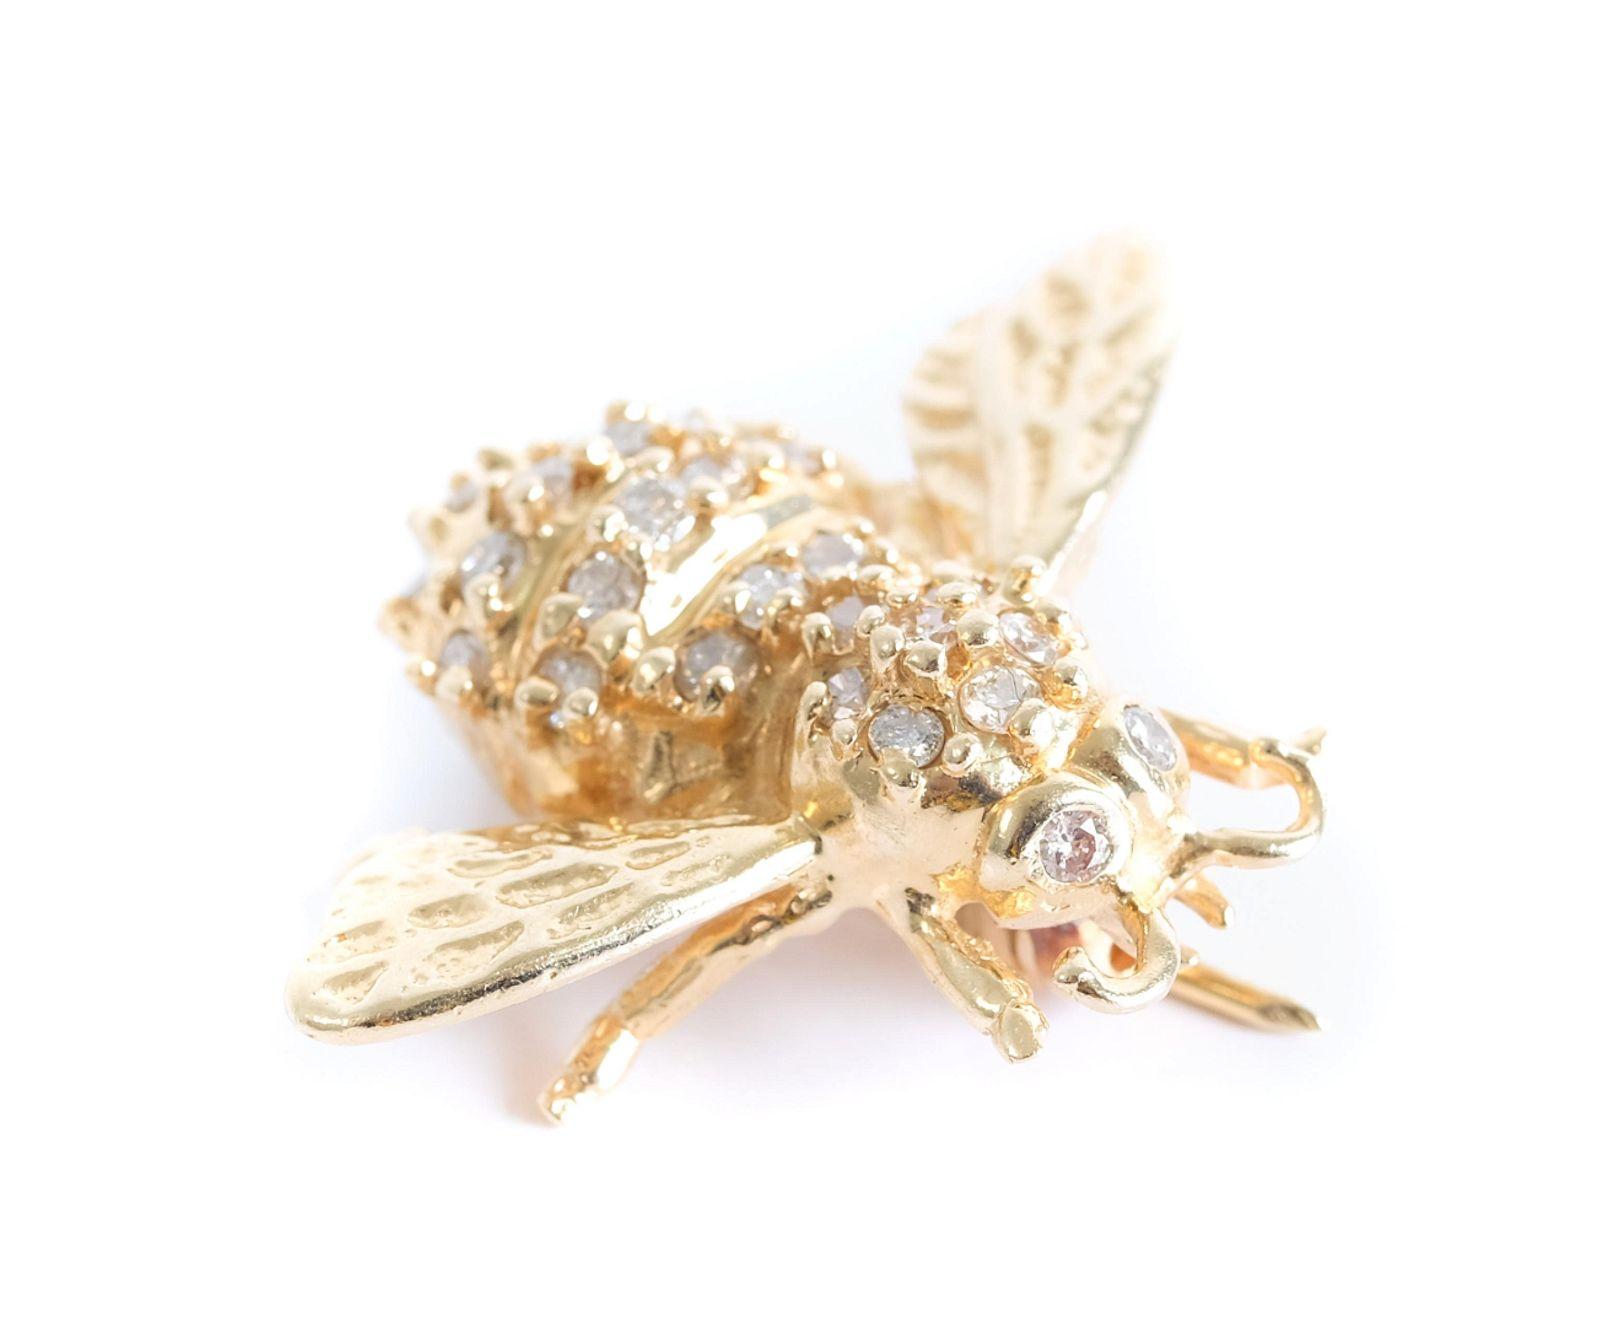 Vintage 14K YG Diamond Bee Pin Clyde Duneier